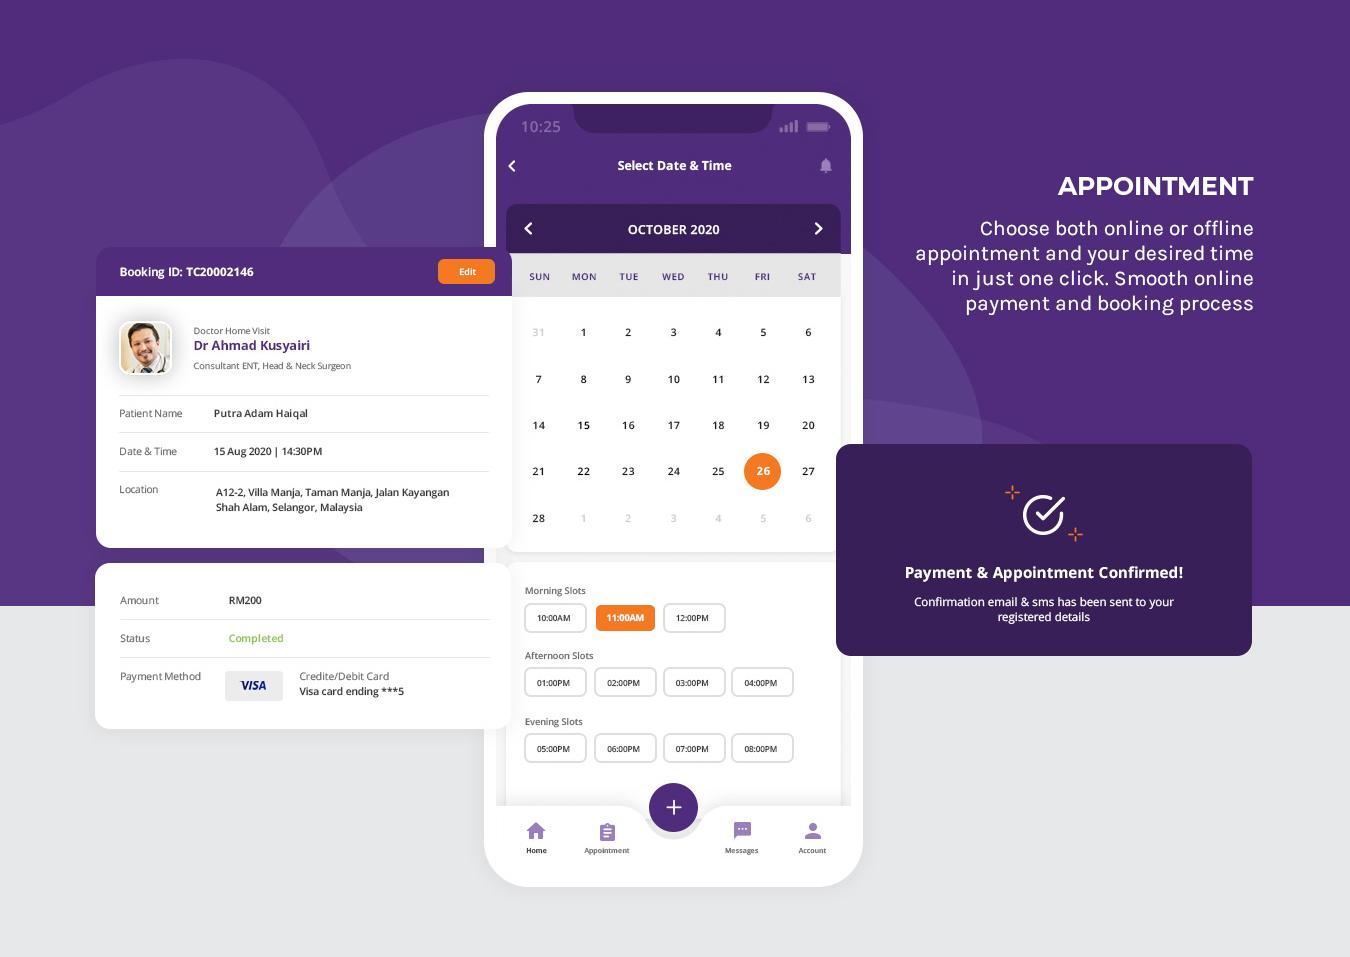 TrueCare2U - Mobile Application - Appointment